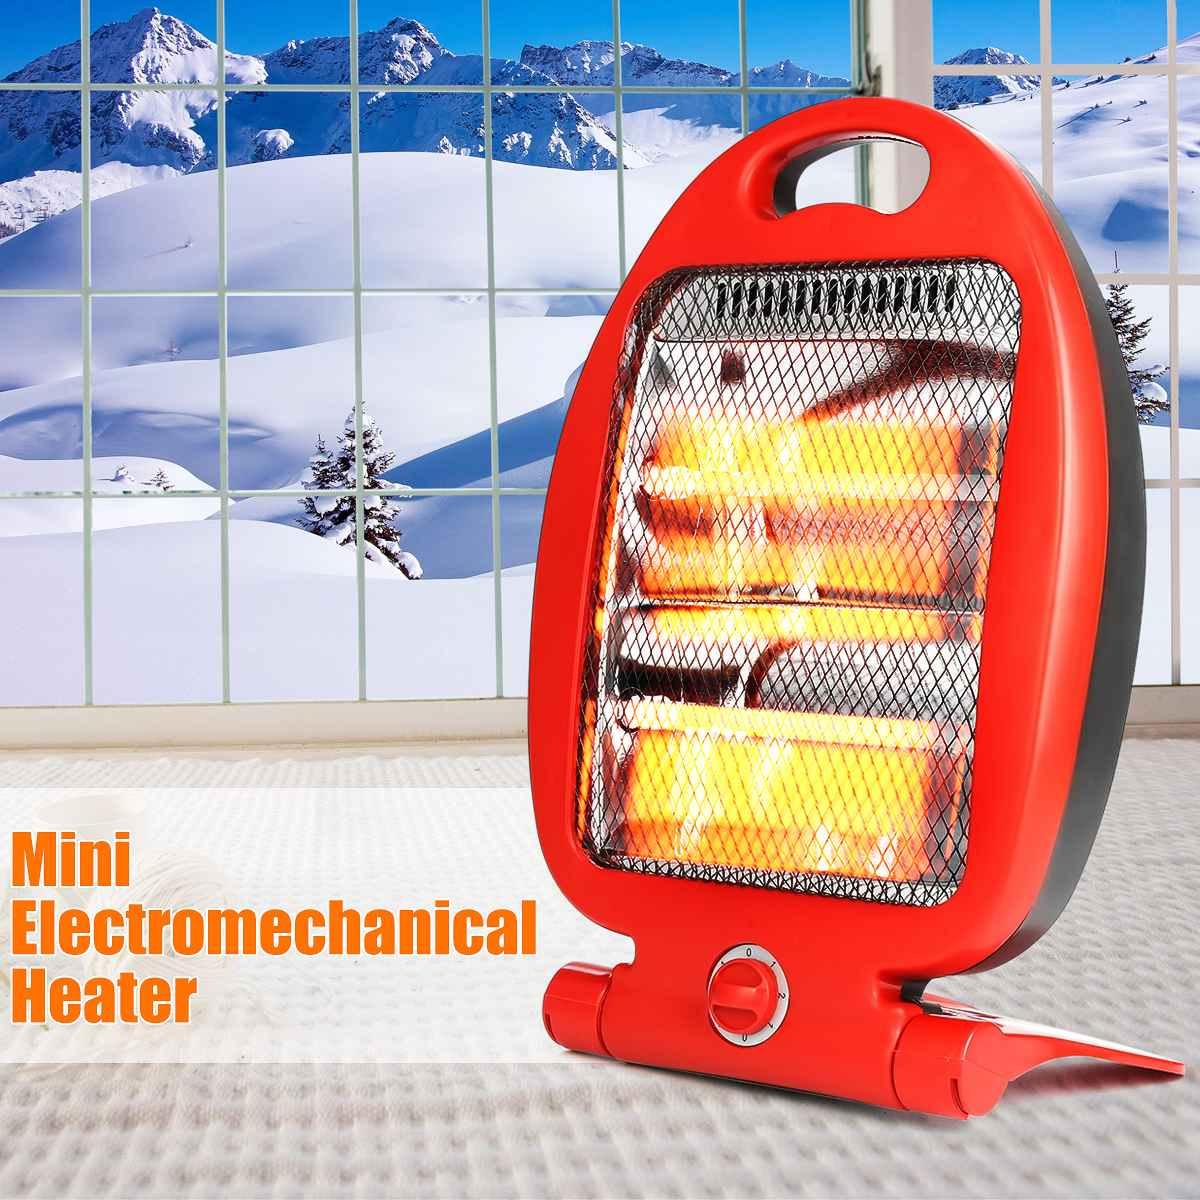 800W Adjustable Portable Electric Heaters Home Room Floor Desk Electric Fan Heater Warmer Hot Winter Electromechanical Heater